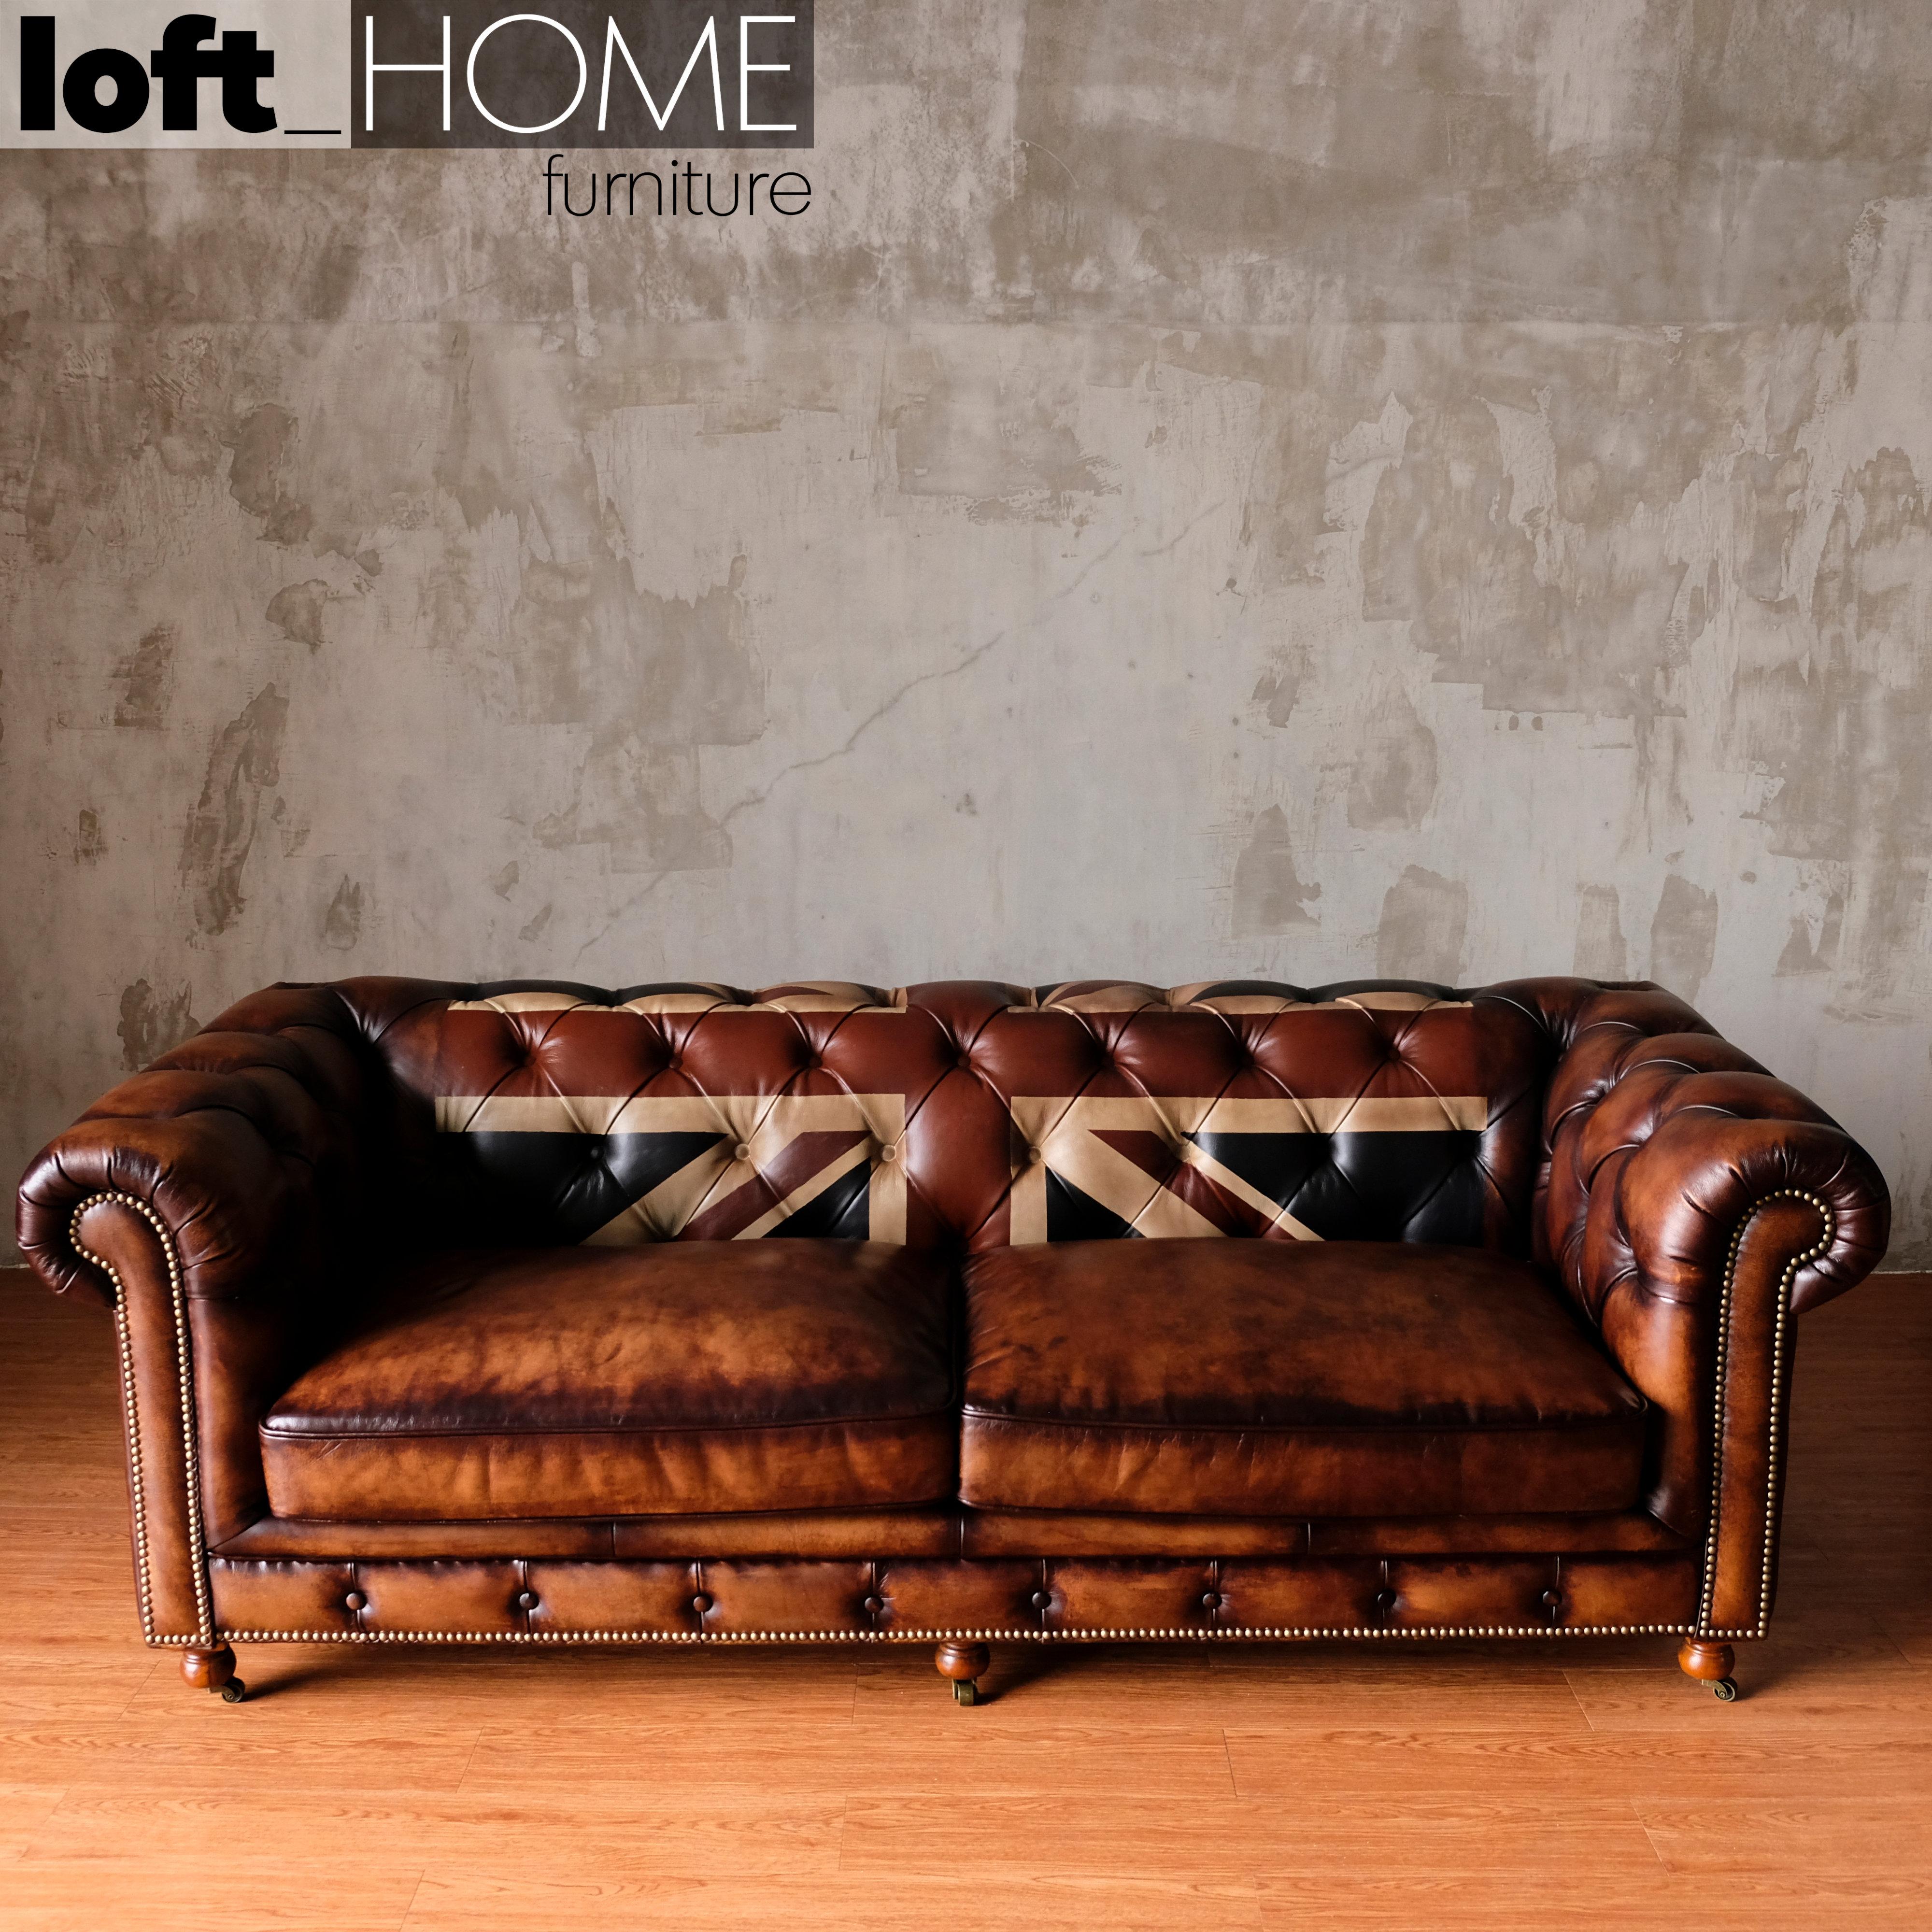 Full Genuine Leather Sofa - Chesterfield Union Jack   lofthomefurniture